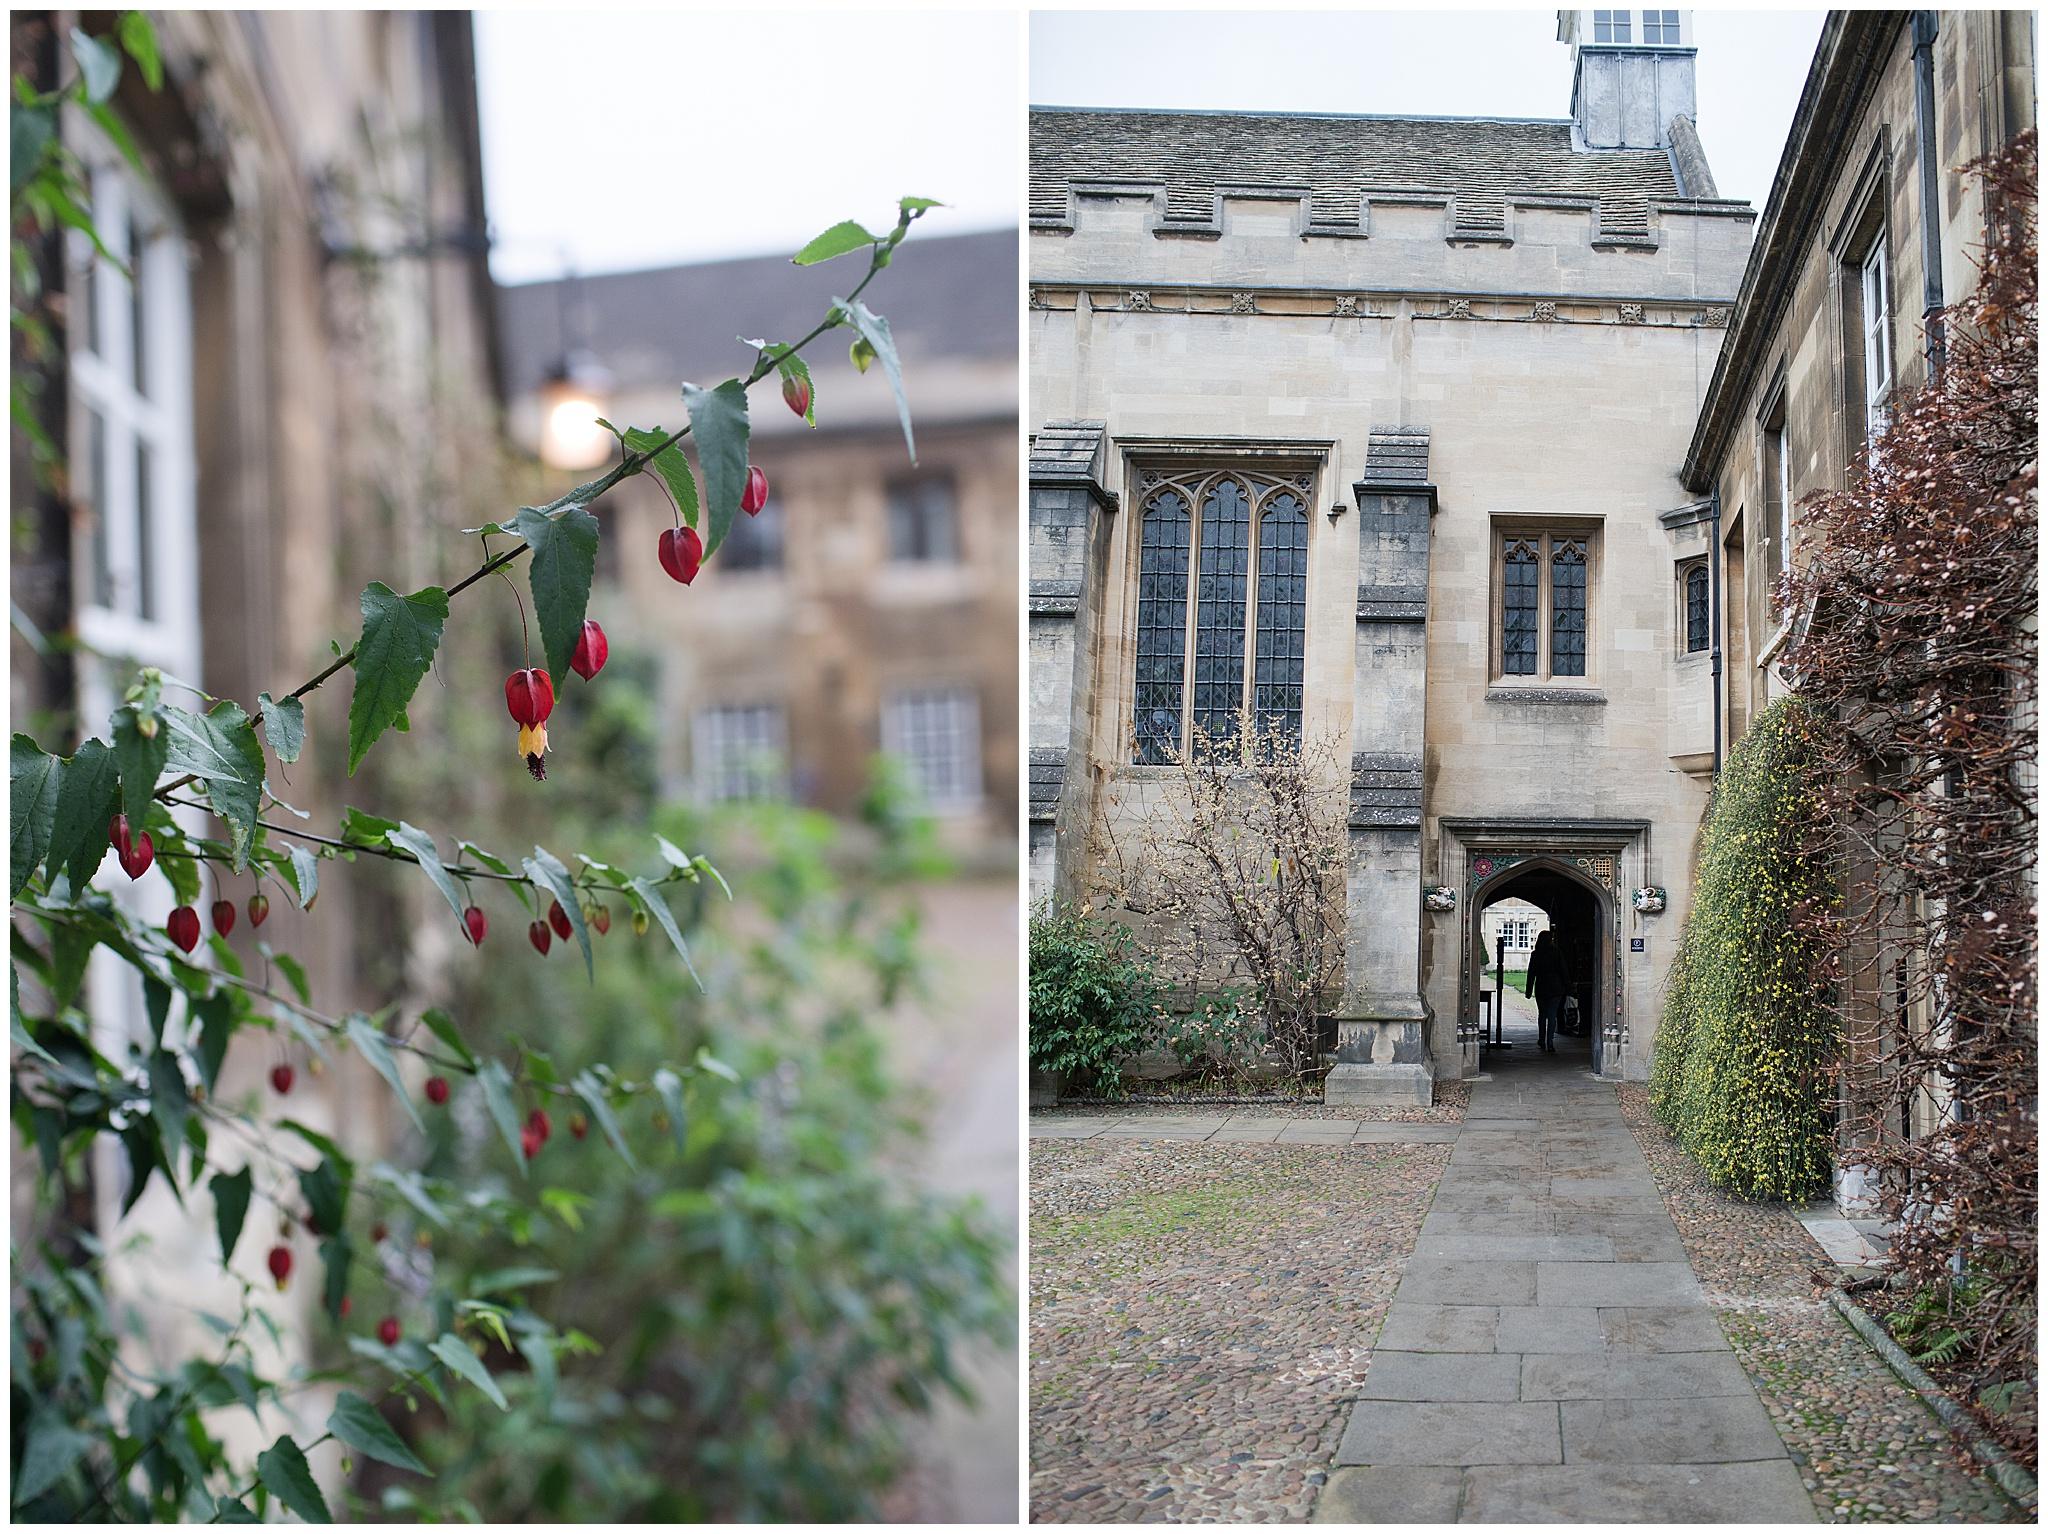 Cambridge_day1_0005.jpg